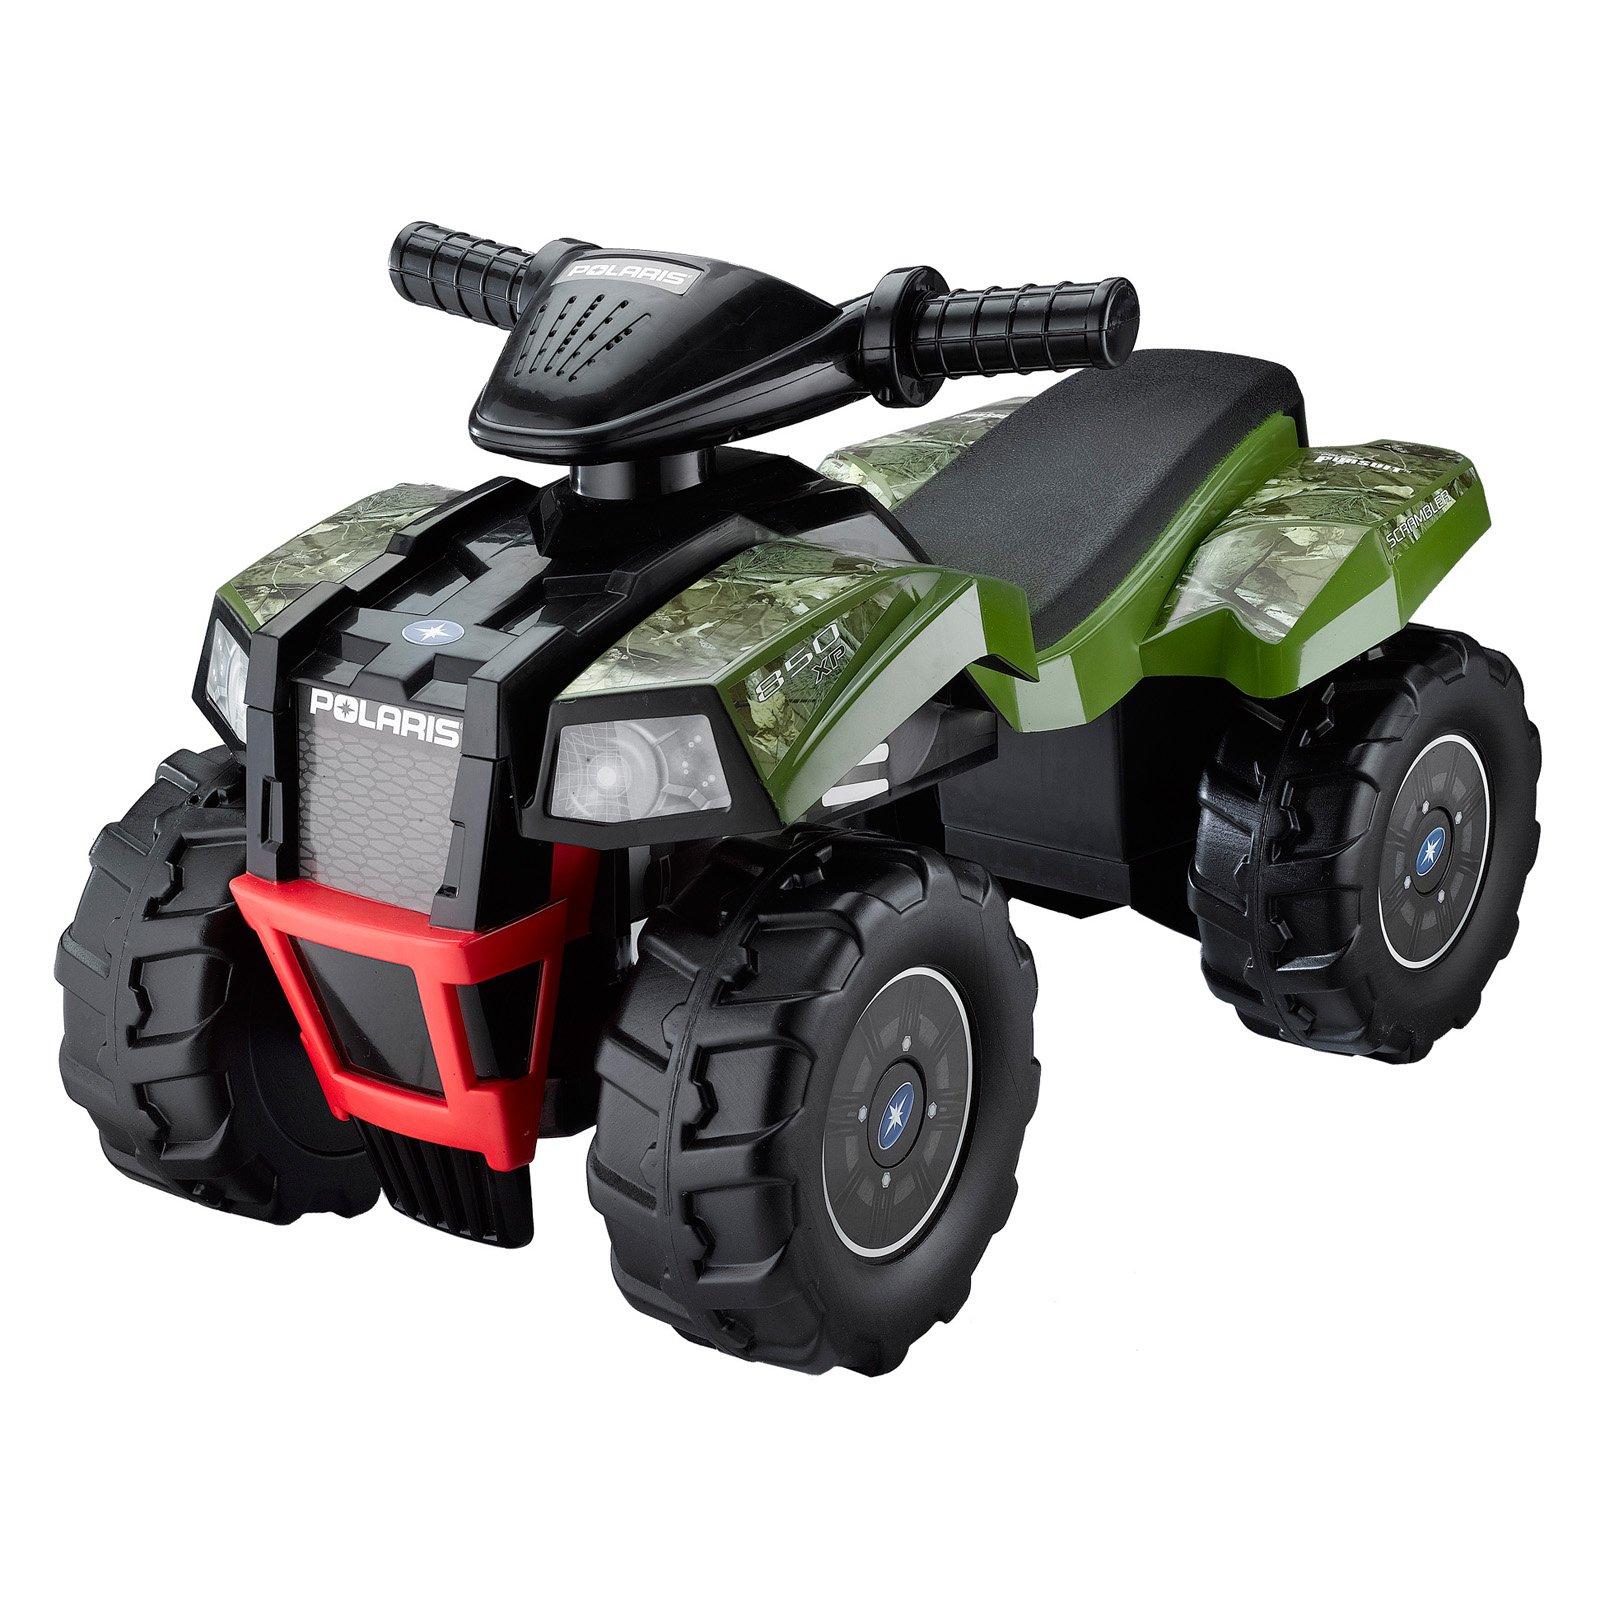 Tek Nek Toys Polaris Green HD Camo Scrambler ATV Ride - On